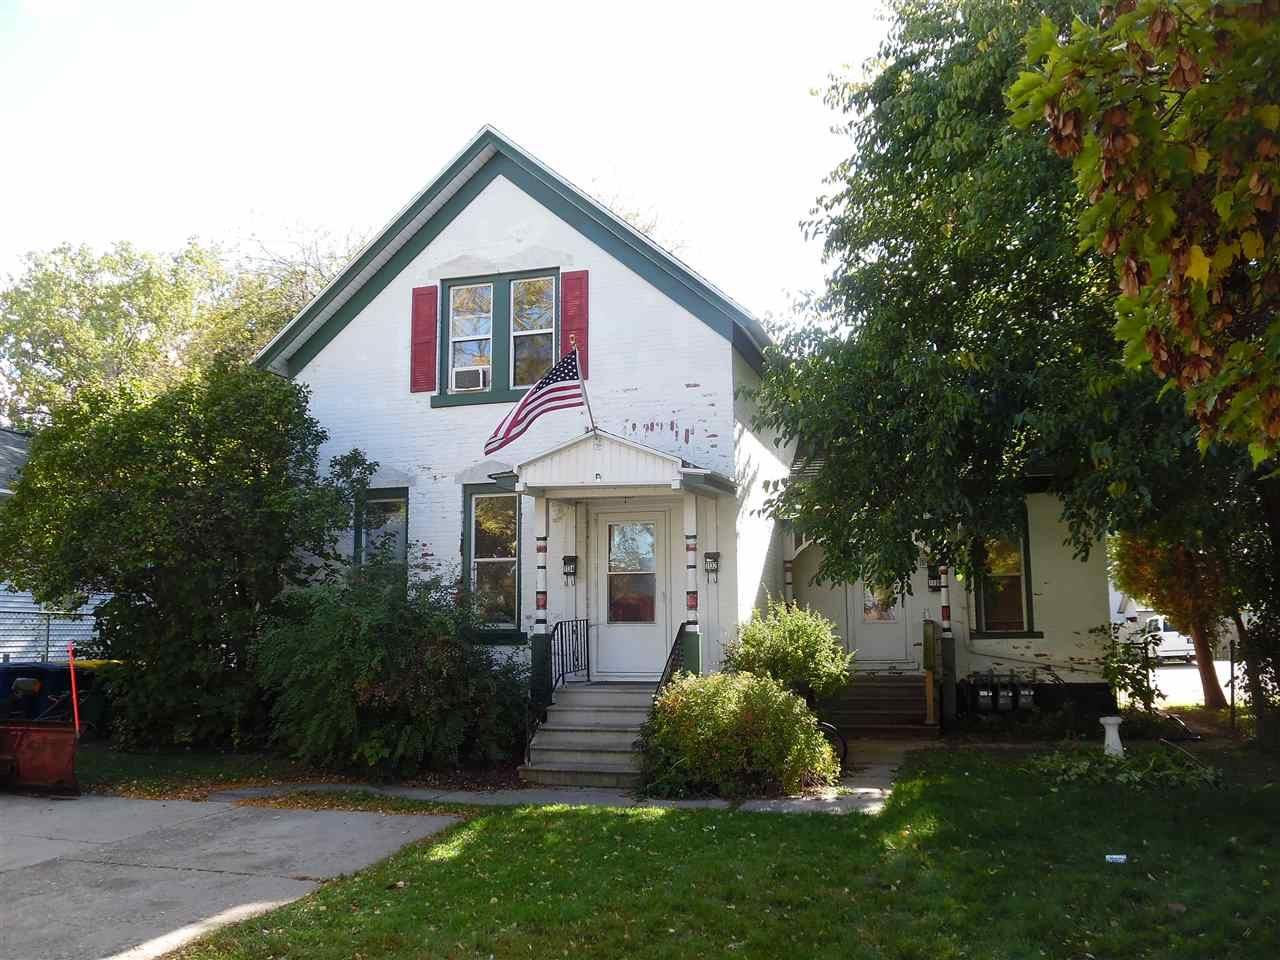 1130 PINE Street, Green Bay, WI 54301 - MLS#: 50232490